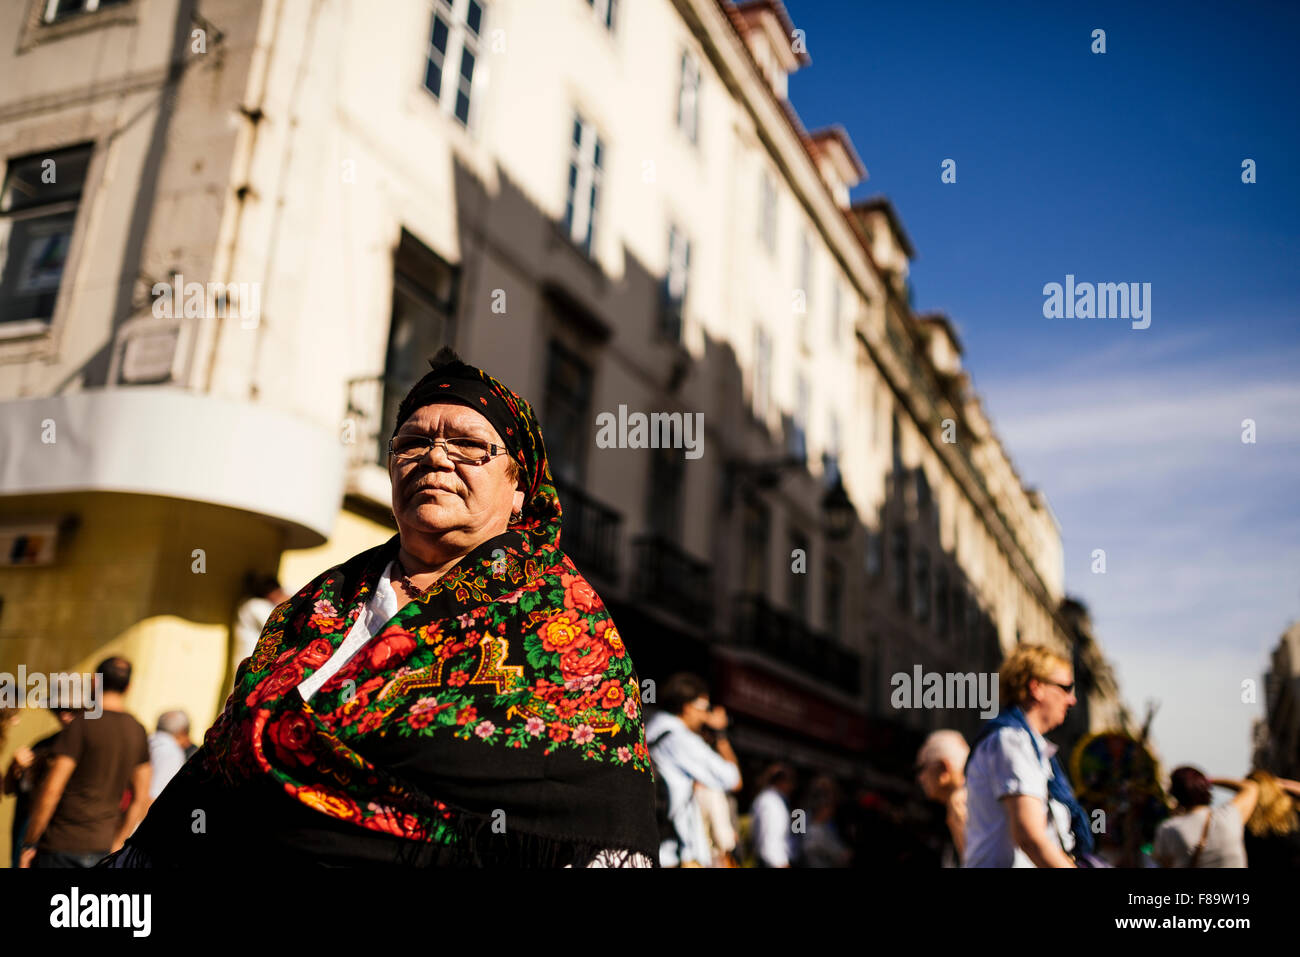 Internationale Festival iberischen Maske, Lissabon, Portugal Stockbild